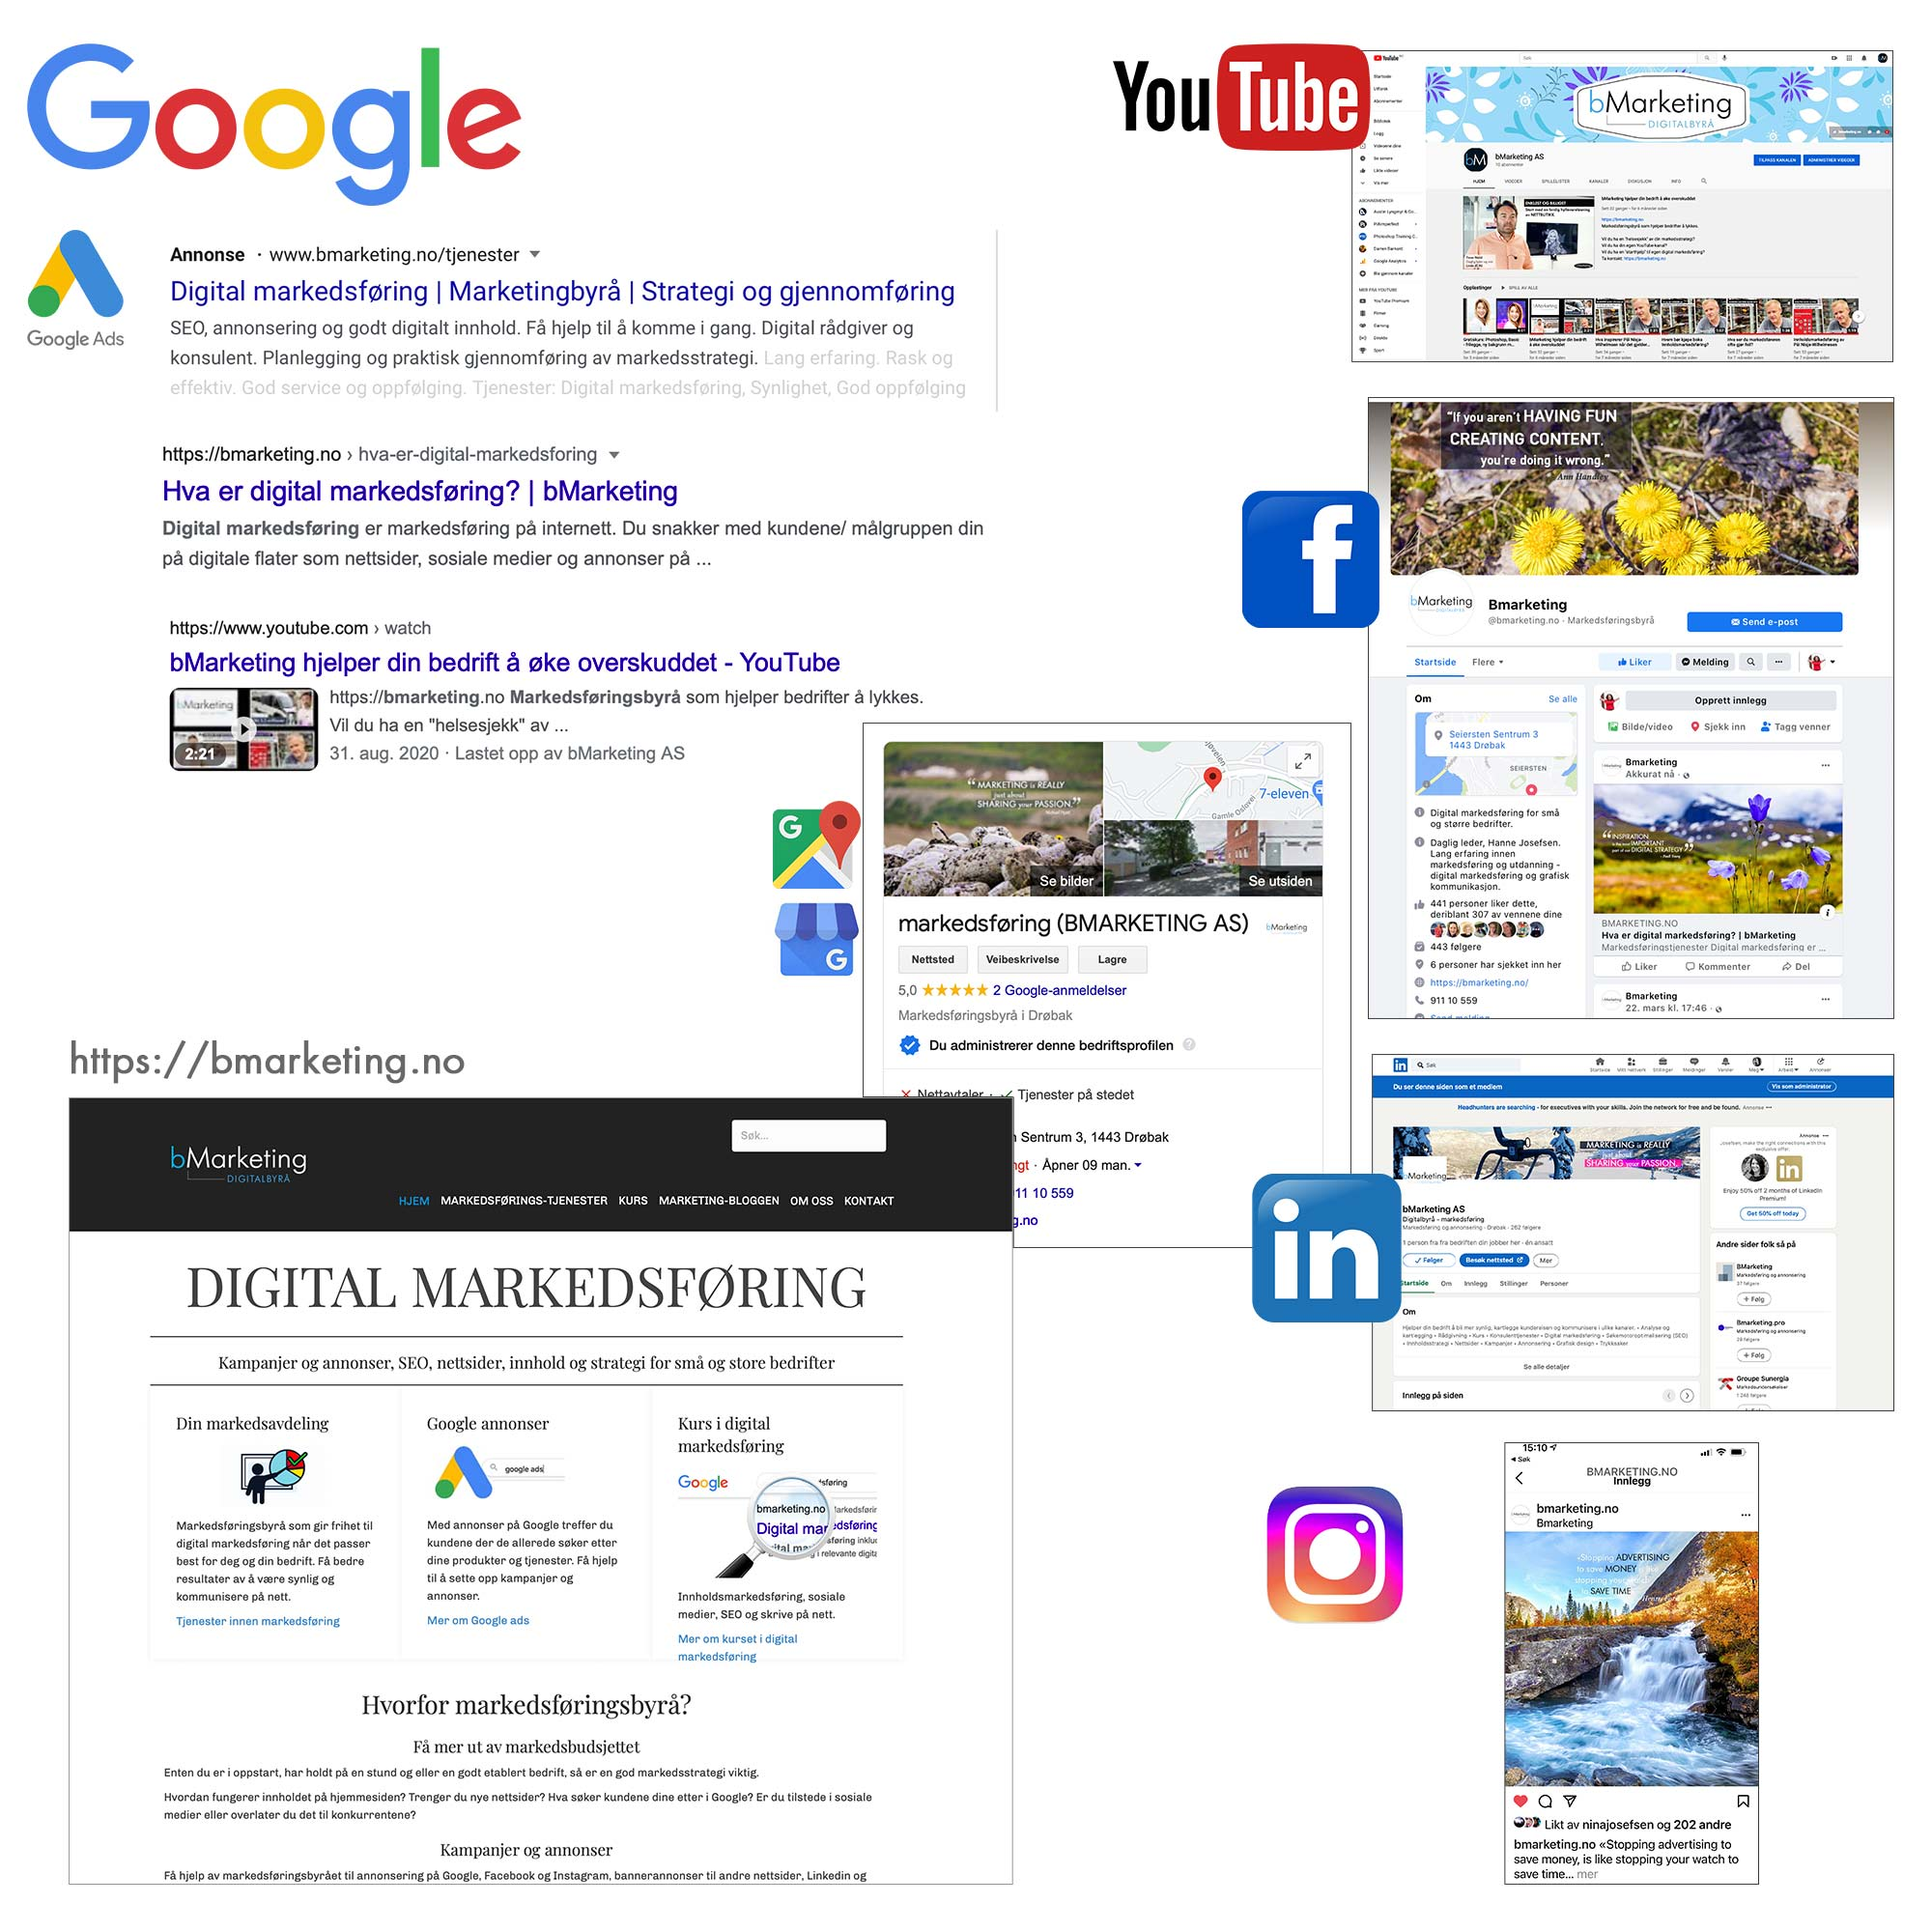 bmarketing er synlig på Google, i Google Ads, på YouTube, Facebook, LinkedIn og Instagram, samt Google Map og Google bedrift.